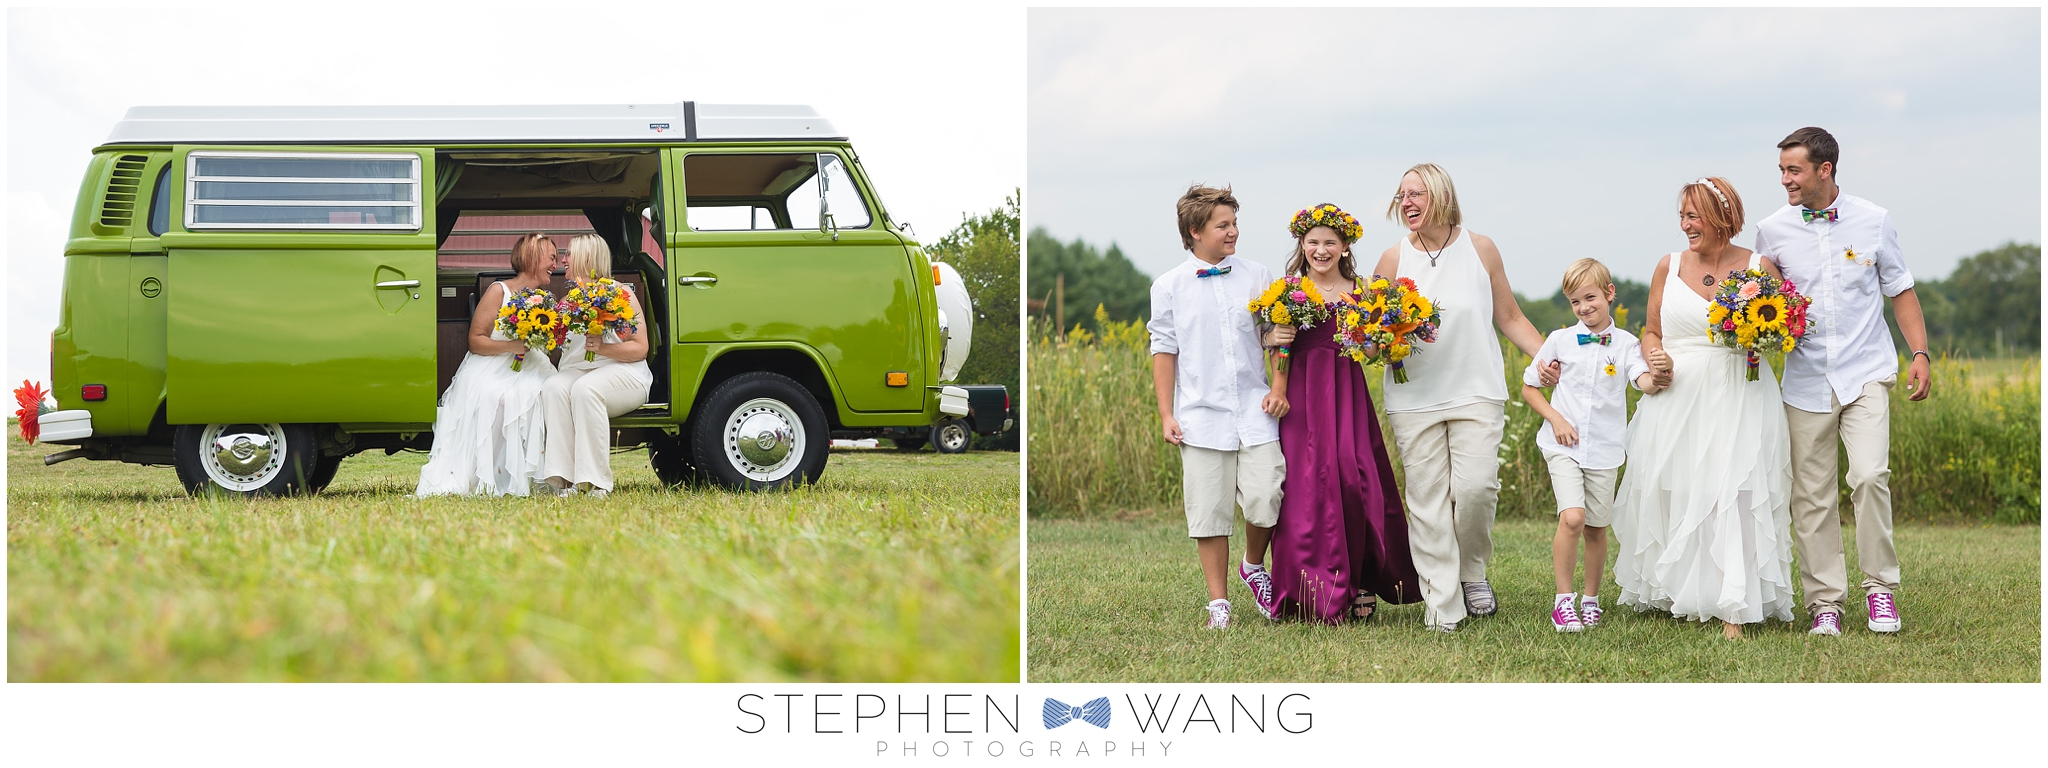 ct wedding photographer stephen wang photography crown point ecology center same sex wedding akron ohio hippie wedding tie die volkwagen bus vw peace connecticut wedding photographer-09-24_0005.jpg